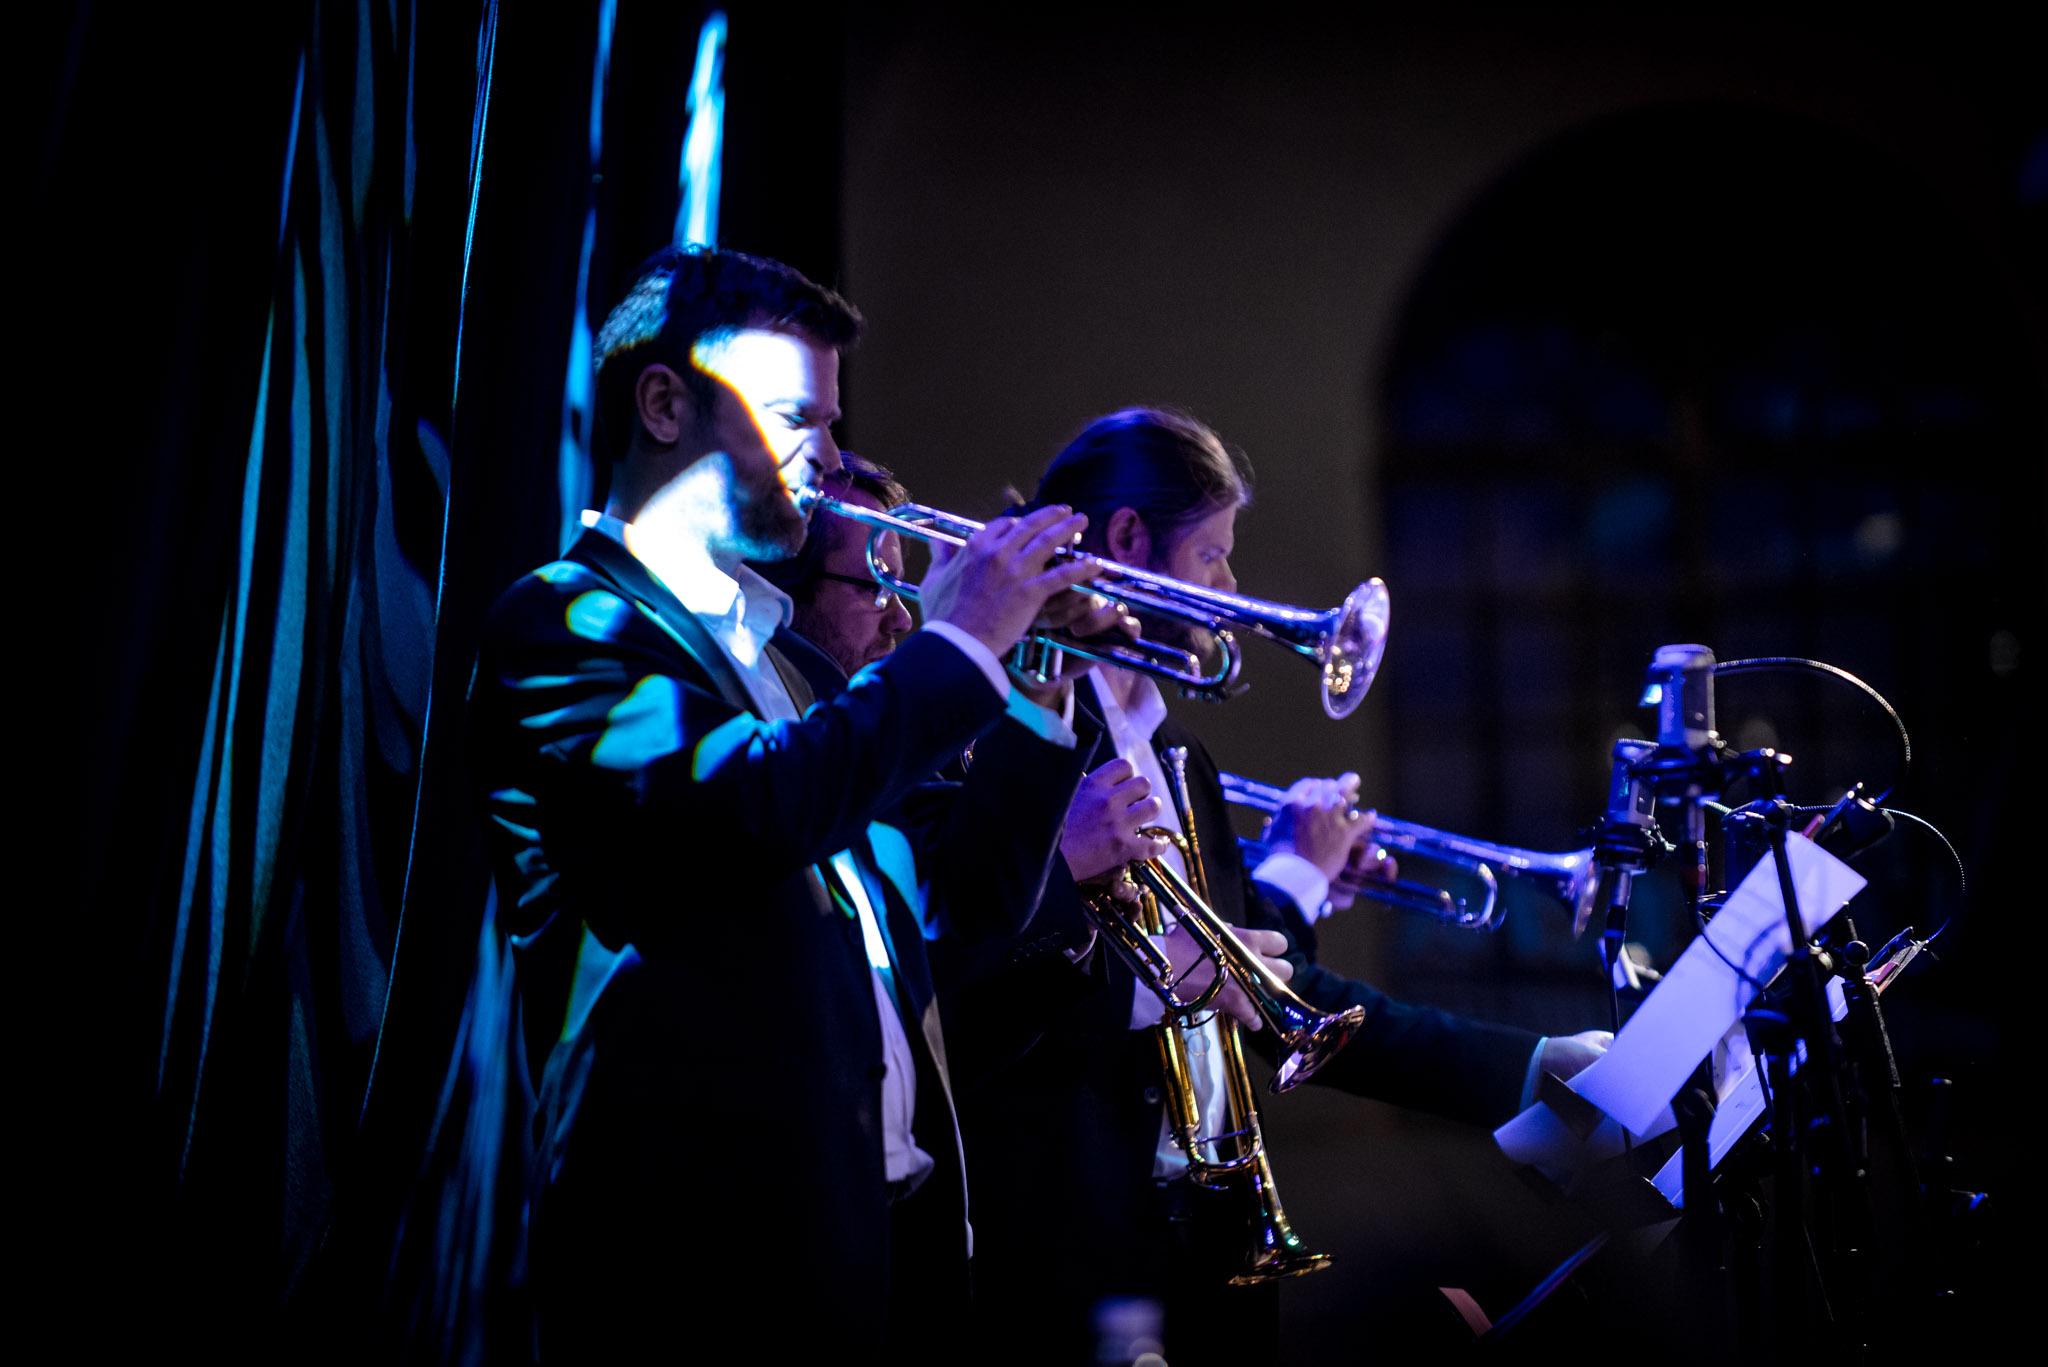 Aarhus Jazz Orchestra Ridehuset Swinger Flamenco Big Band Nights Perico Sambeat